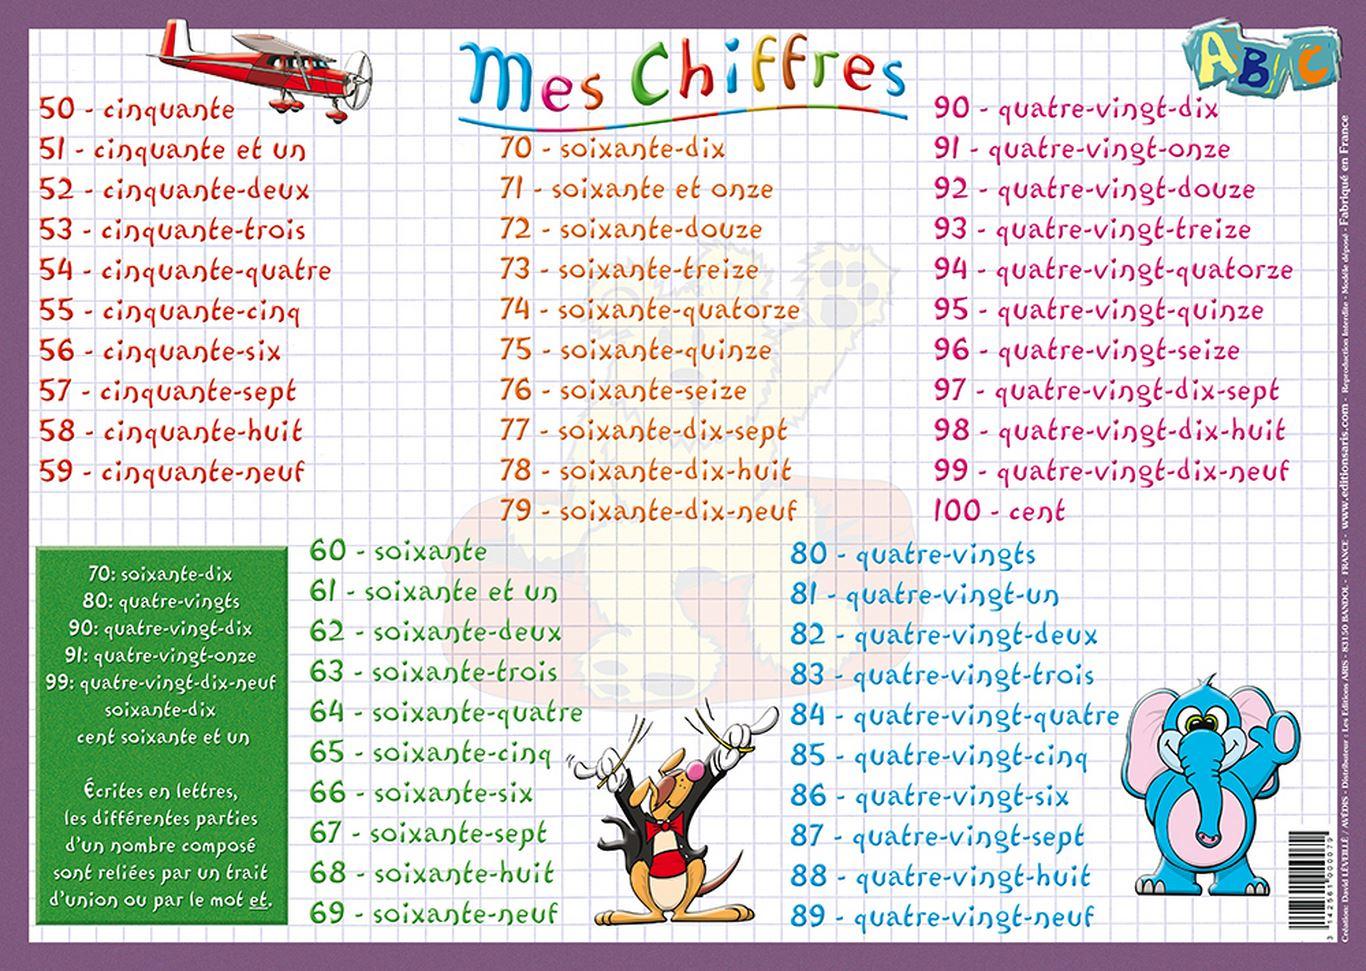 editions aris  u00bb chiffres